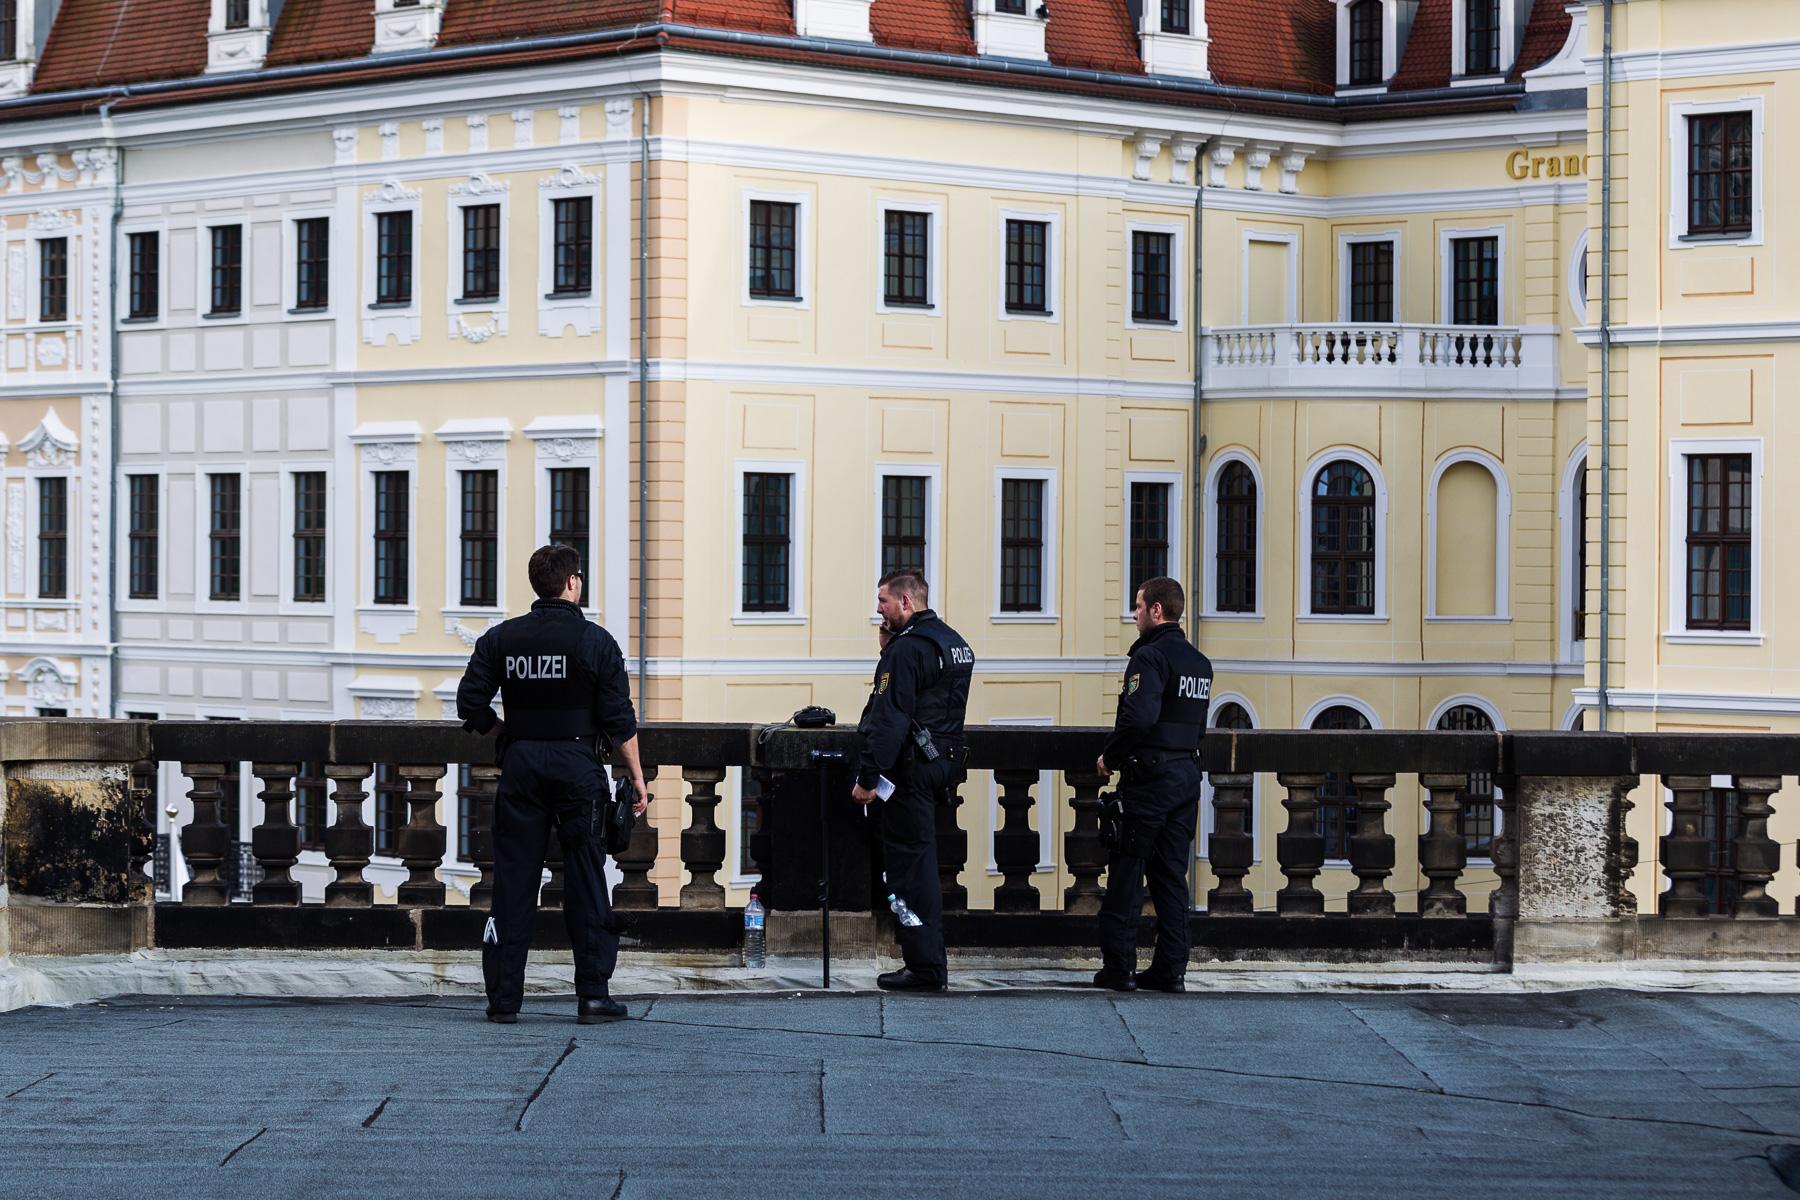 Die Bilderberg-Konferenz in Dresden